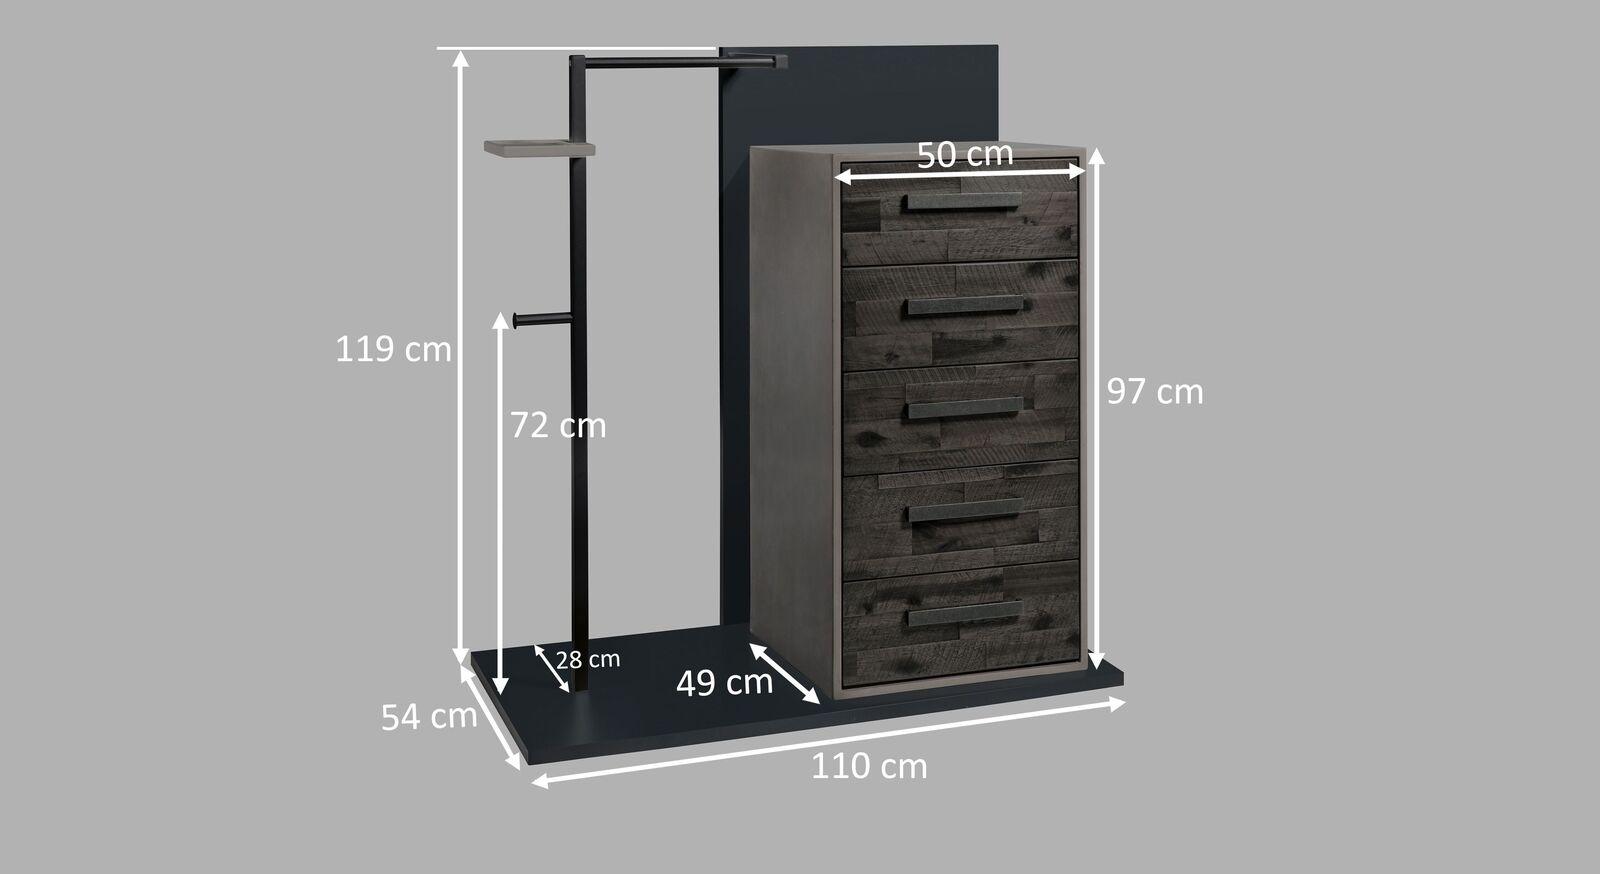 Grafik zur Garderoben-Kommode Envigado